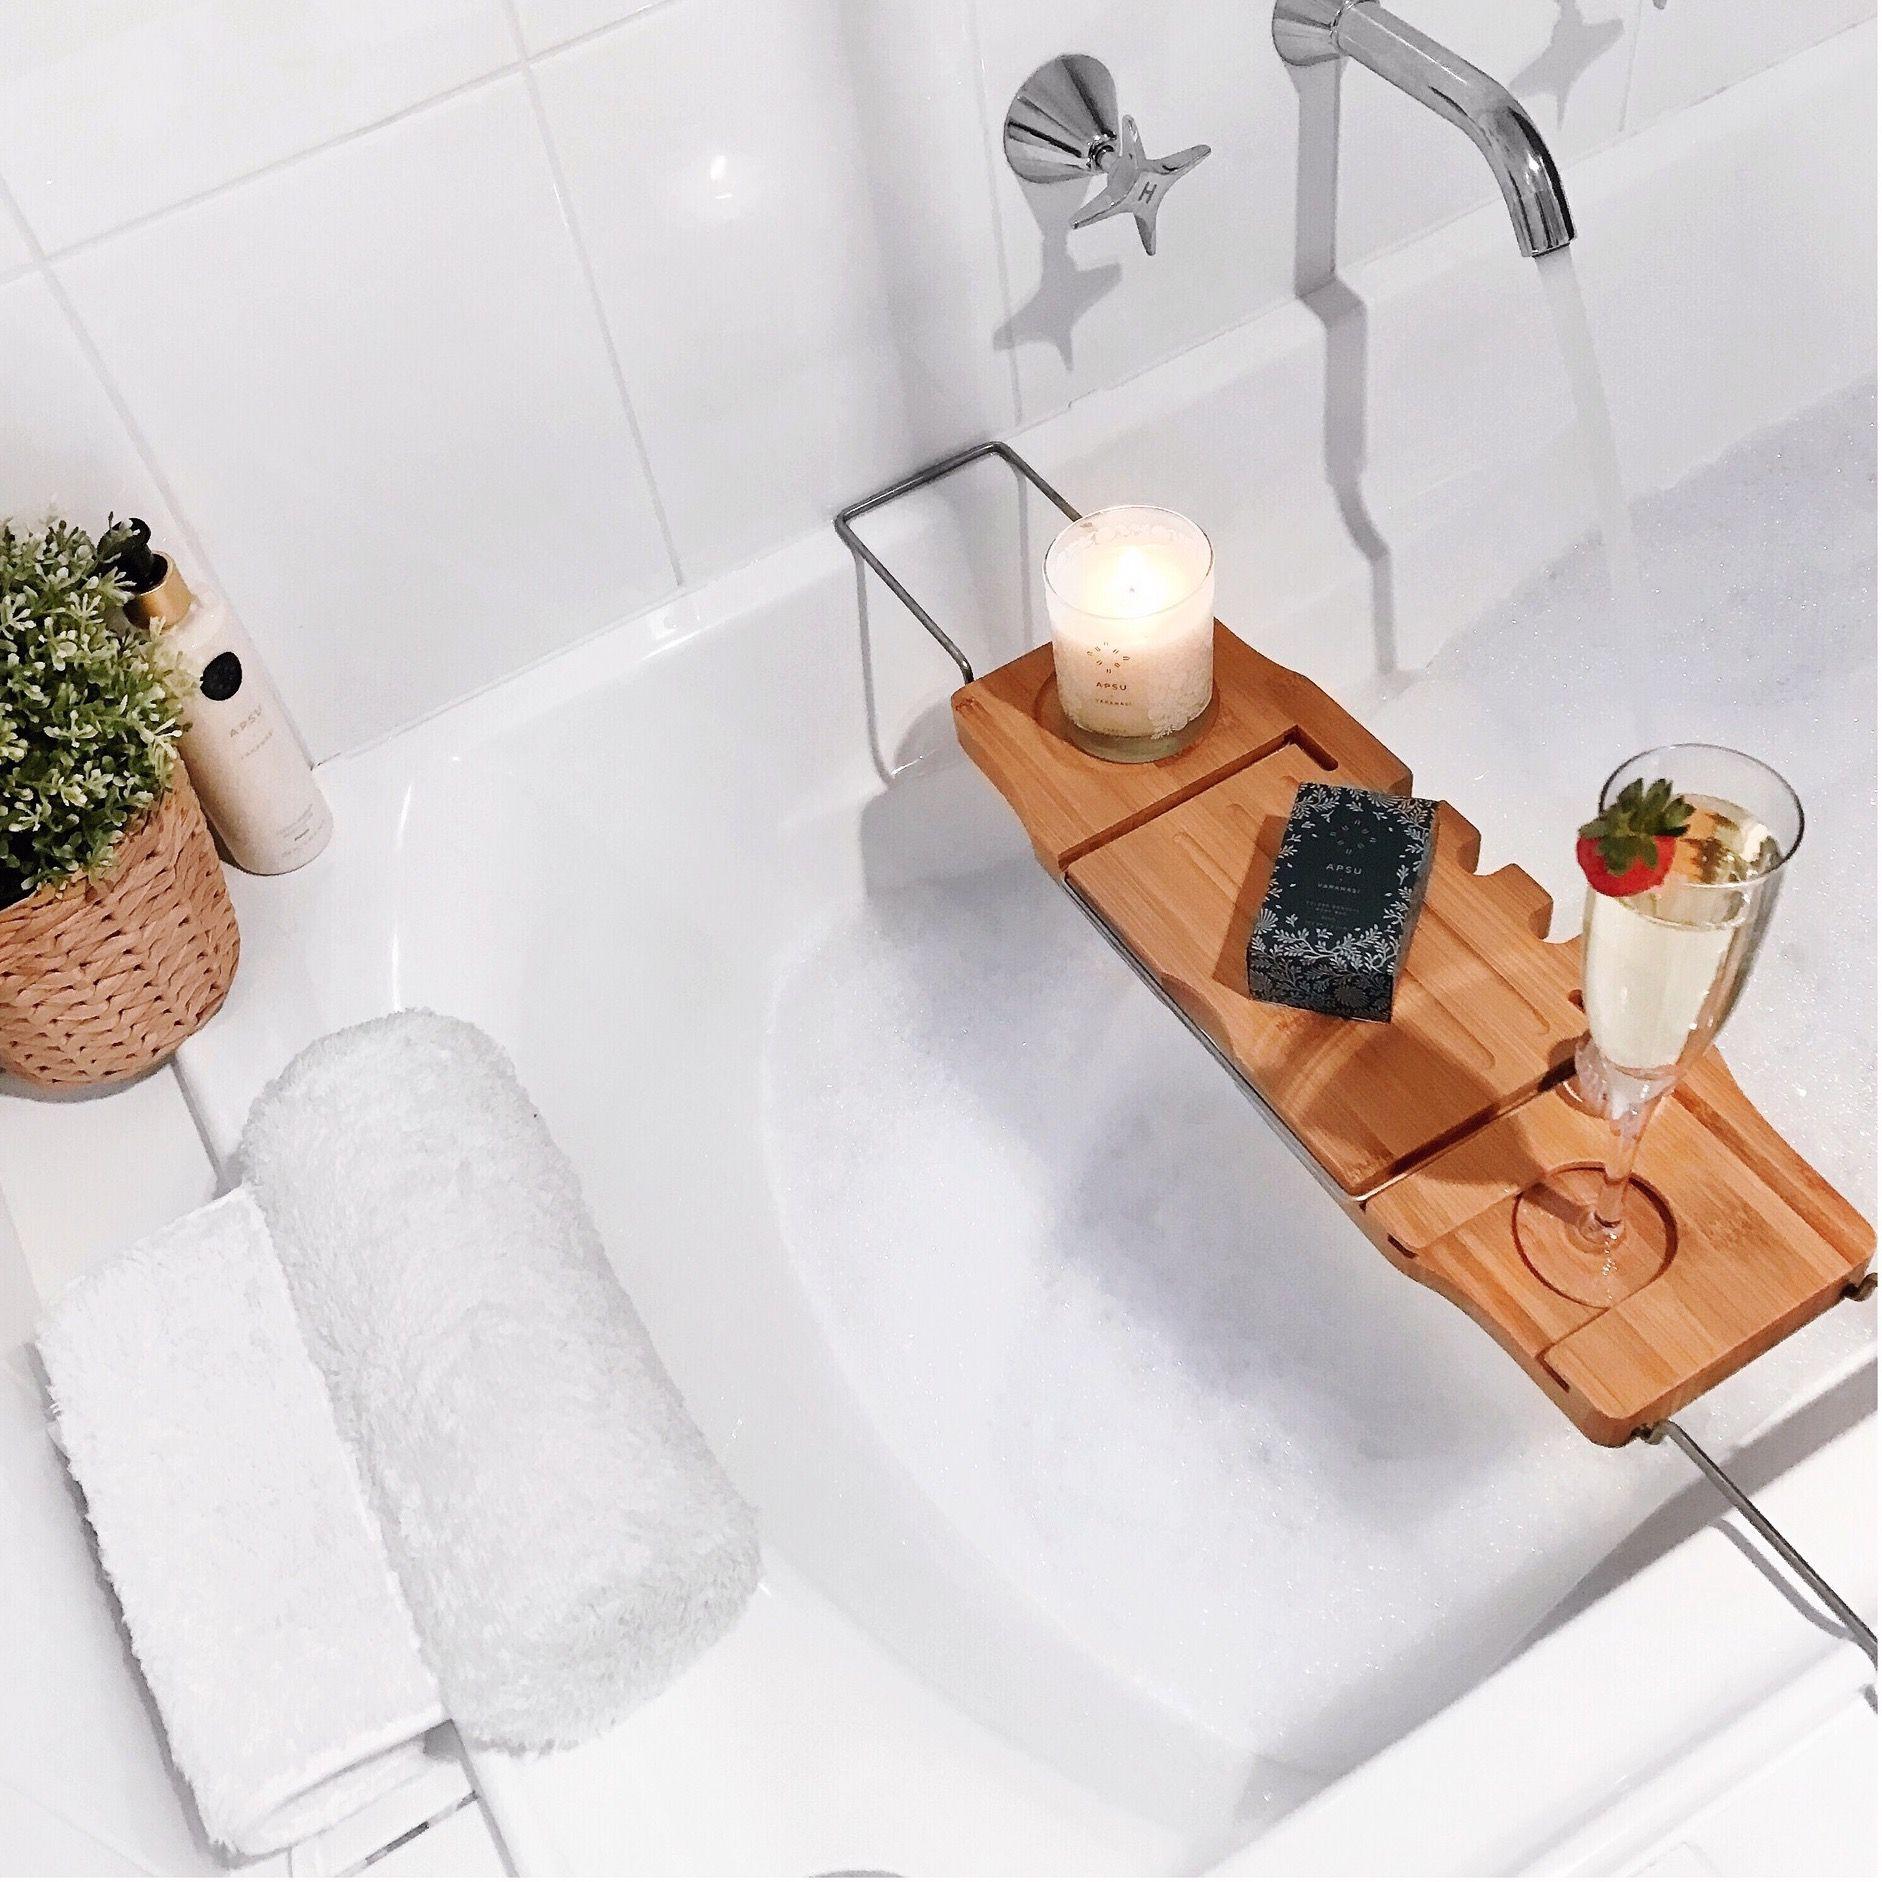 The New Kmart Bath Caddy Via Leerachel Instagram Bathroom Mirror Design Fabric Sofa Cover Microfiber Couch Cover